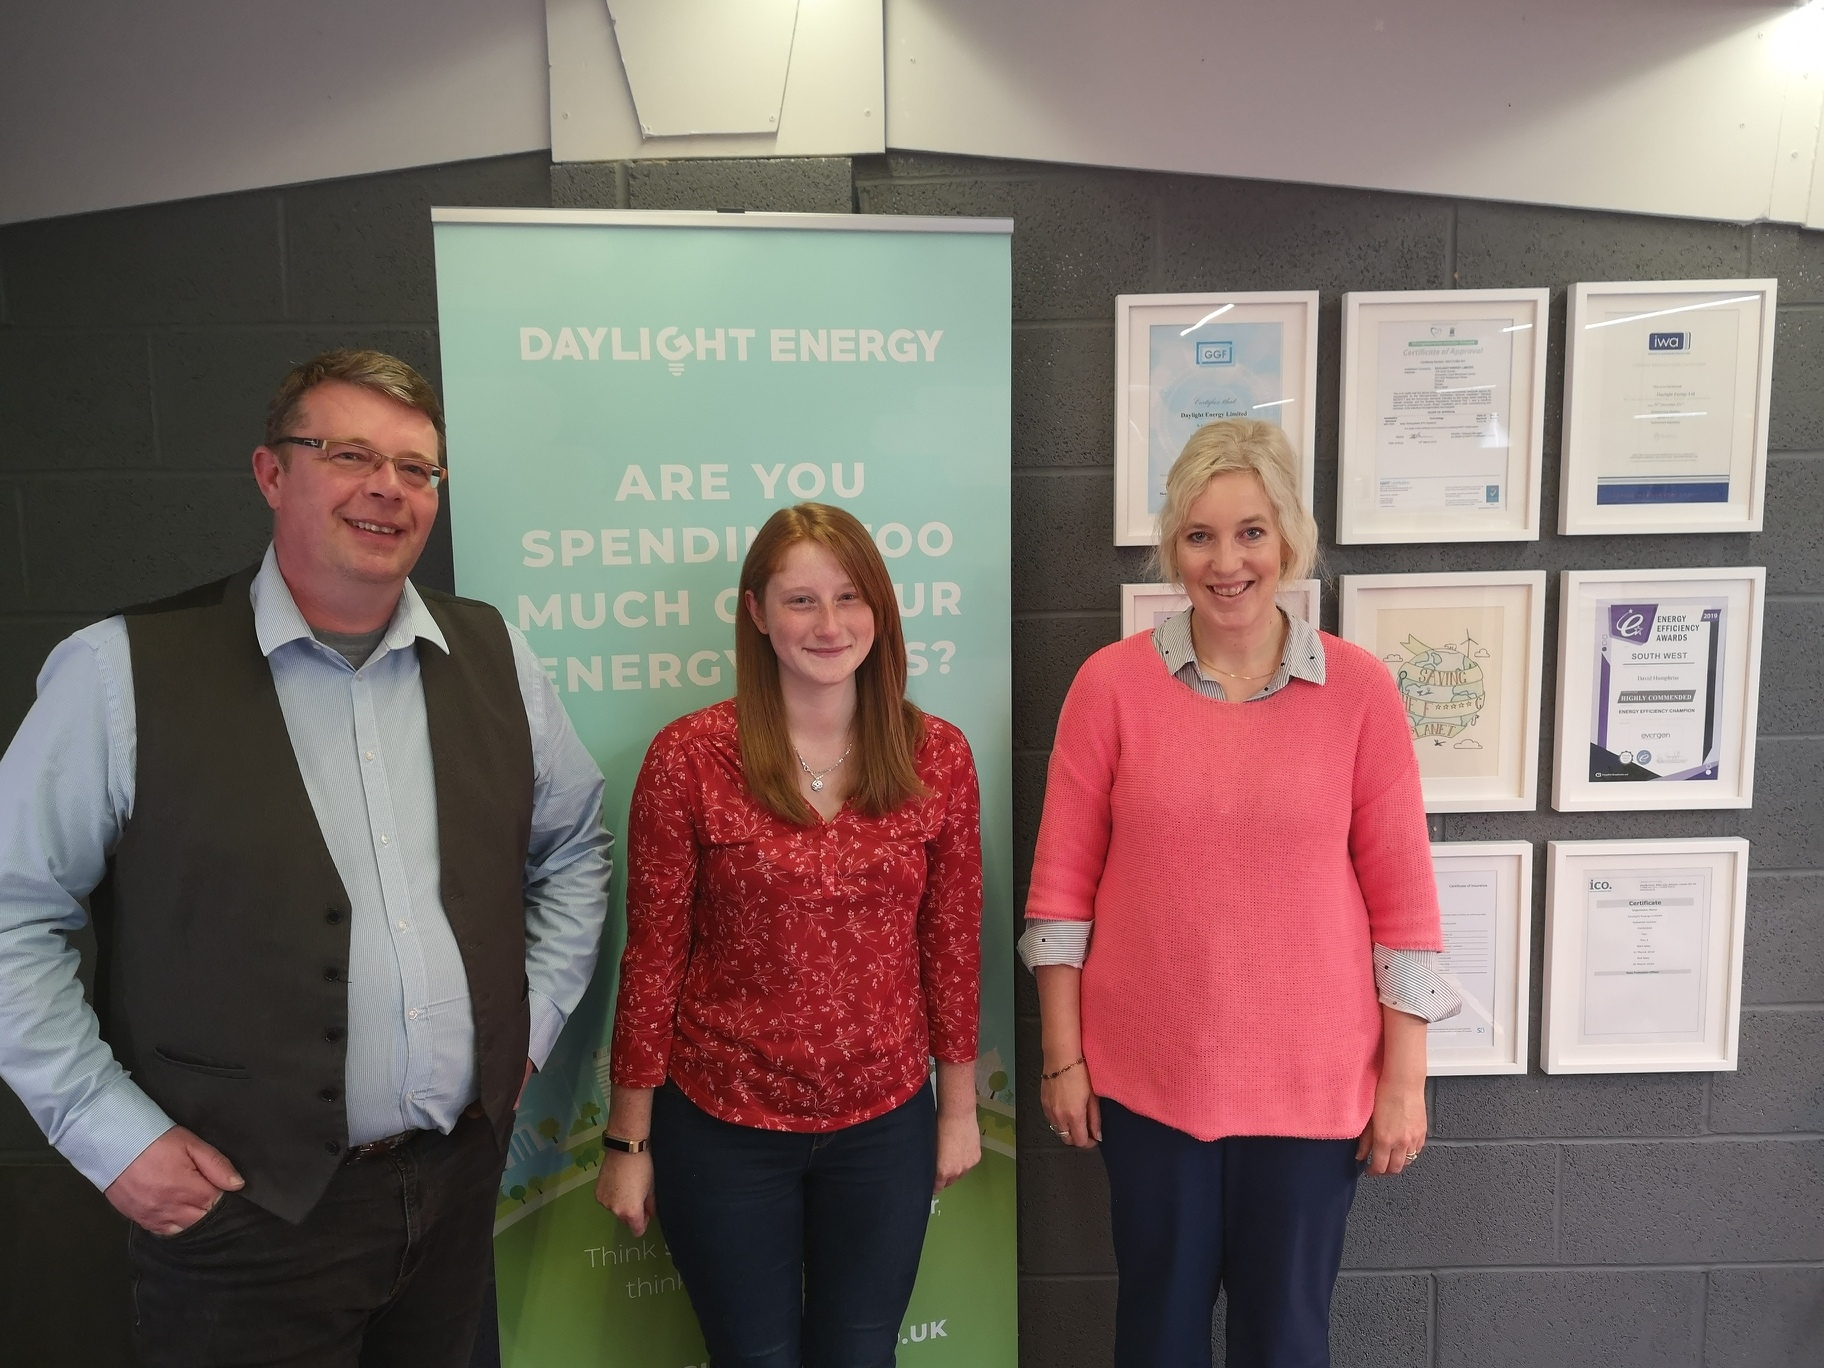 3 new team members for Daylight Energy